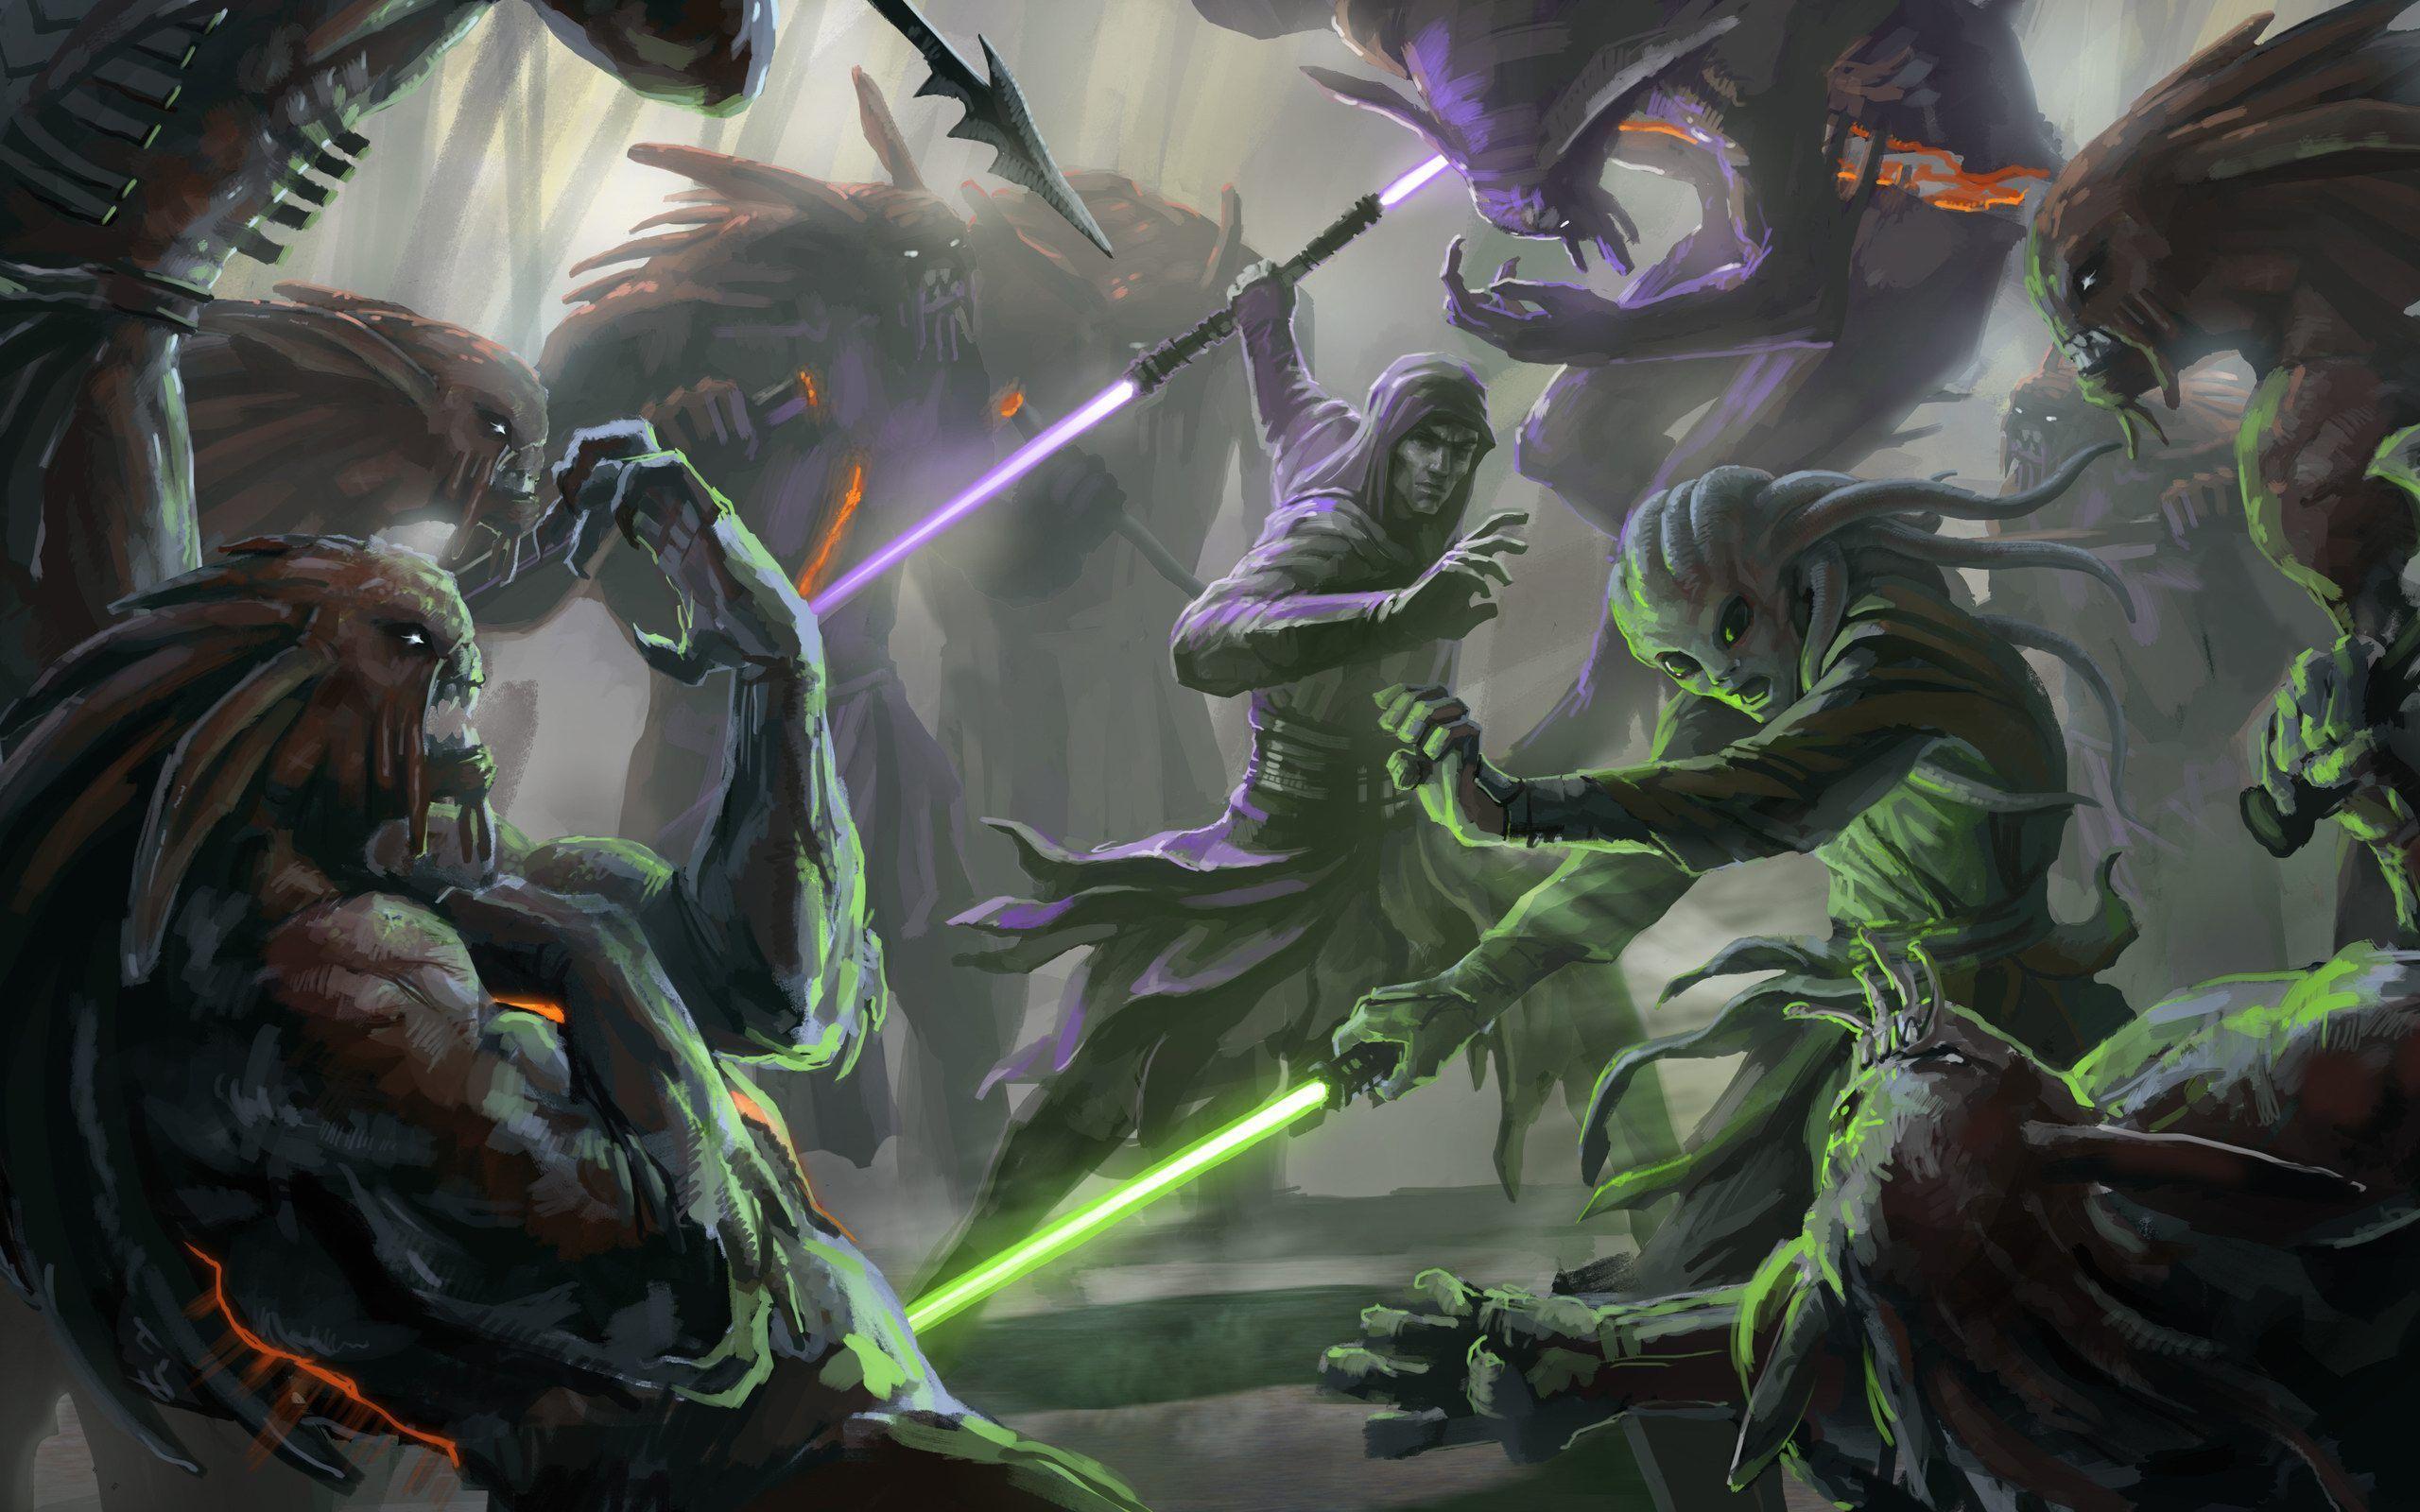 Star Wars Jedi Wallpapers - Wallpaper Cave